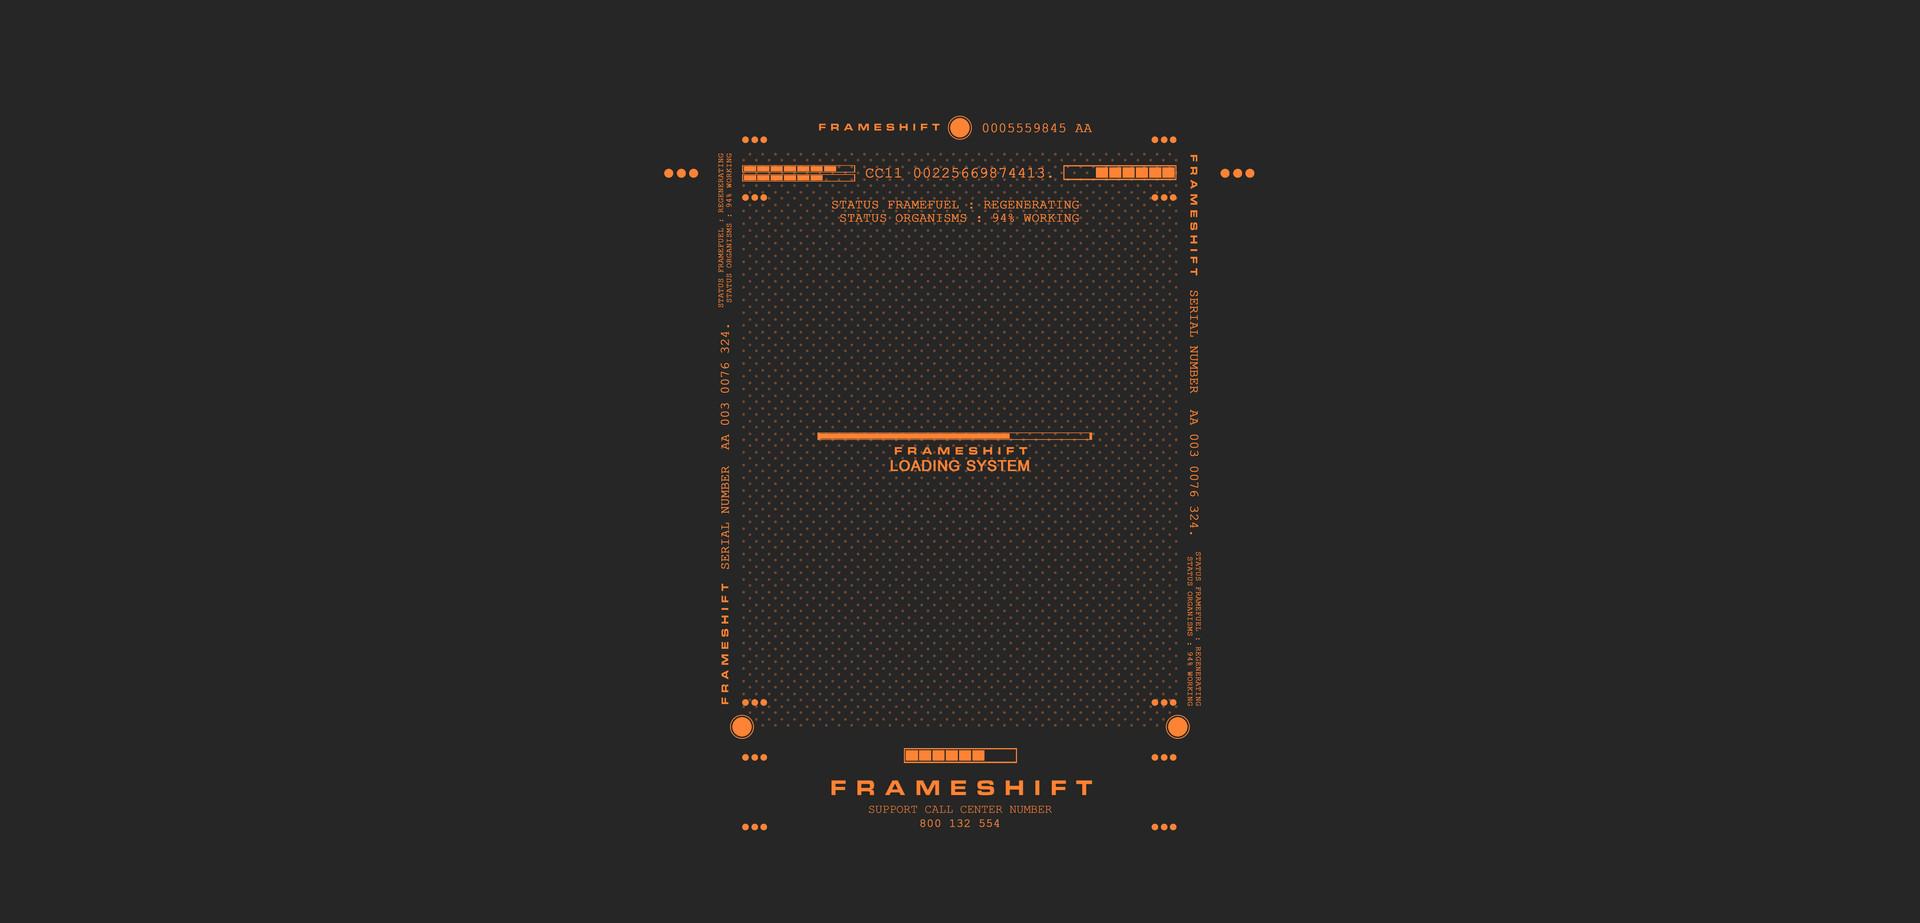 Andrea chiampo display interface